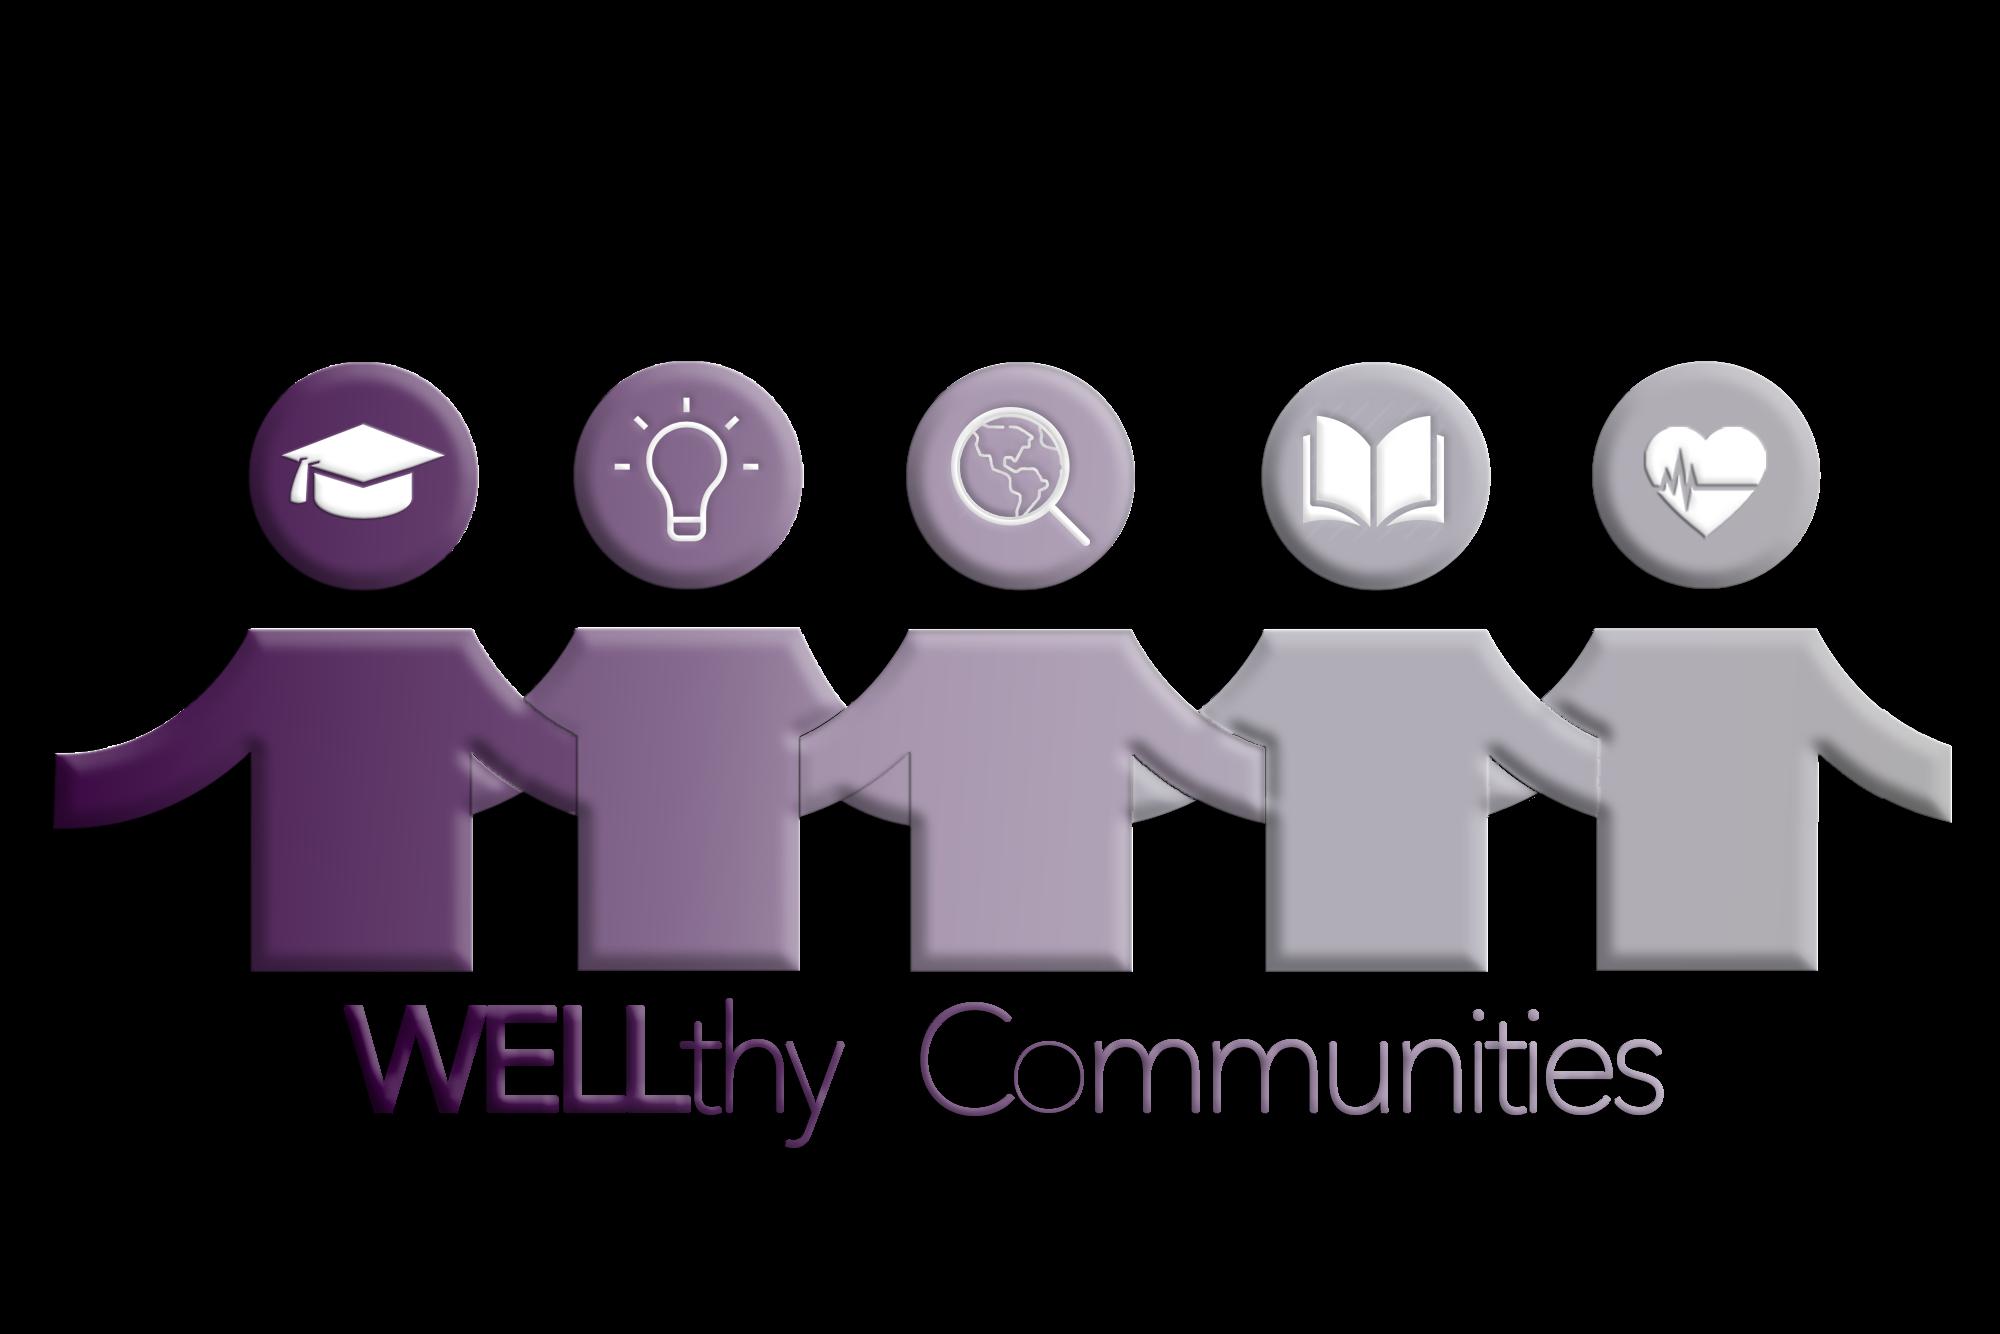 Wellthy Communities